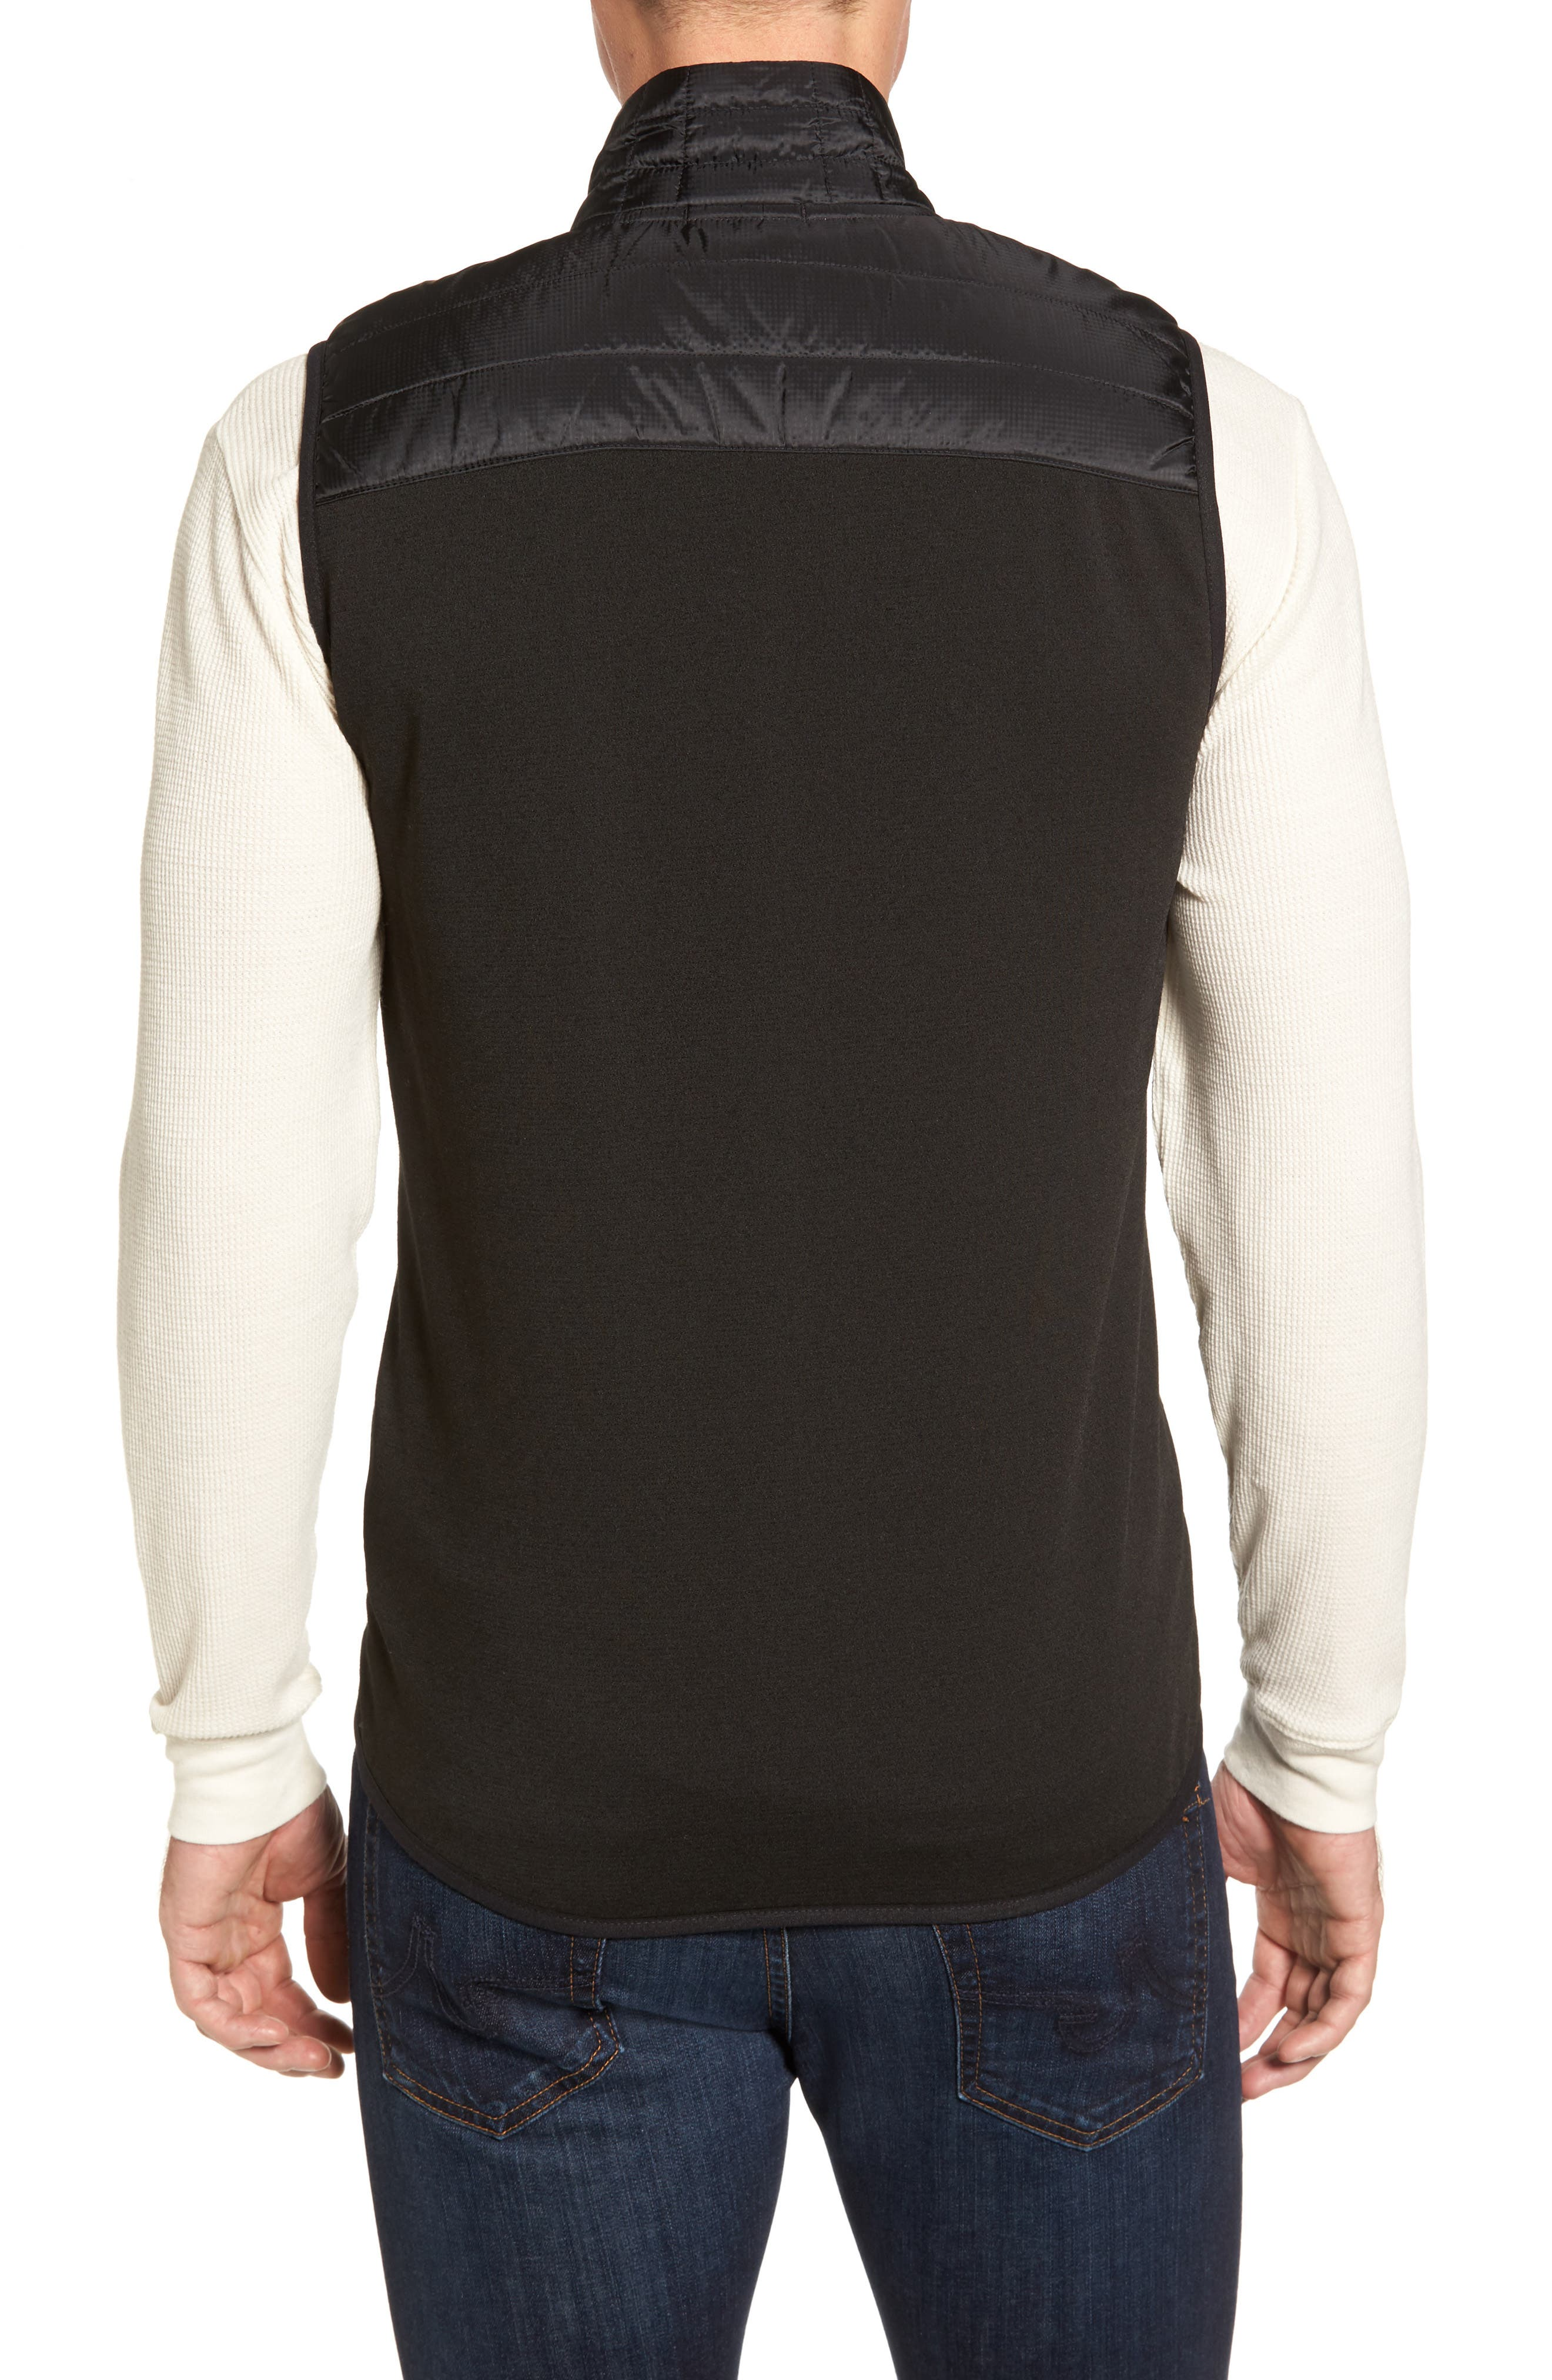 'Corbet 120' Quilted Zip Front Vest,                             Alternate thumbnail 2, color,                             301